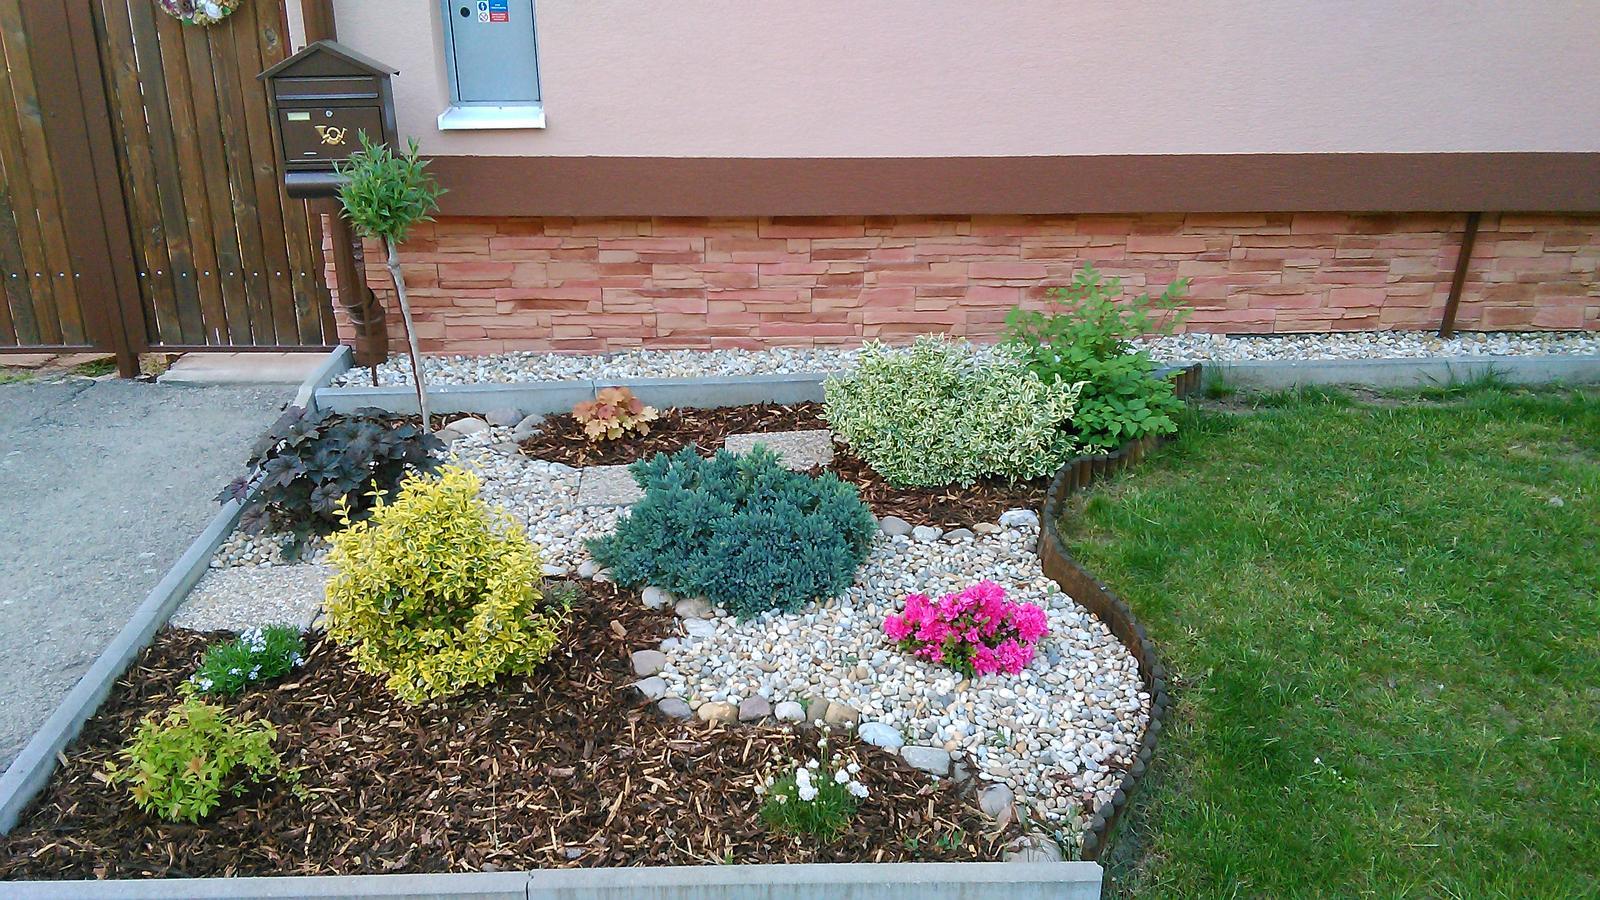 #zahrada  kusok nasej zelene :-) - Obrázok č. 1